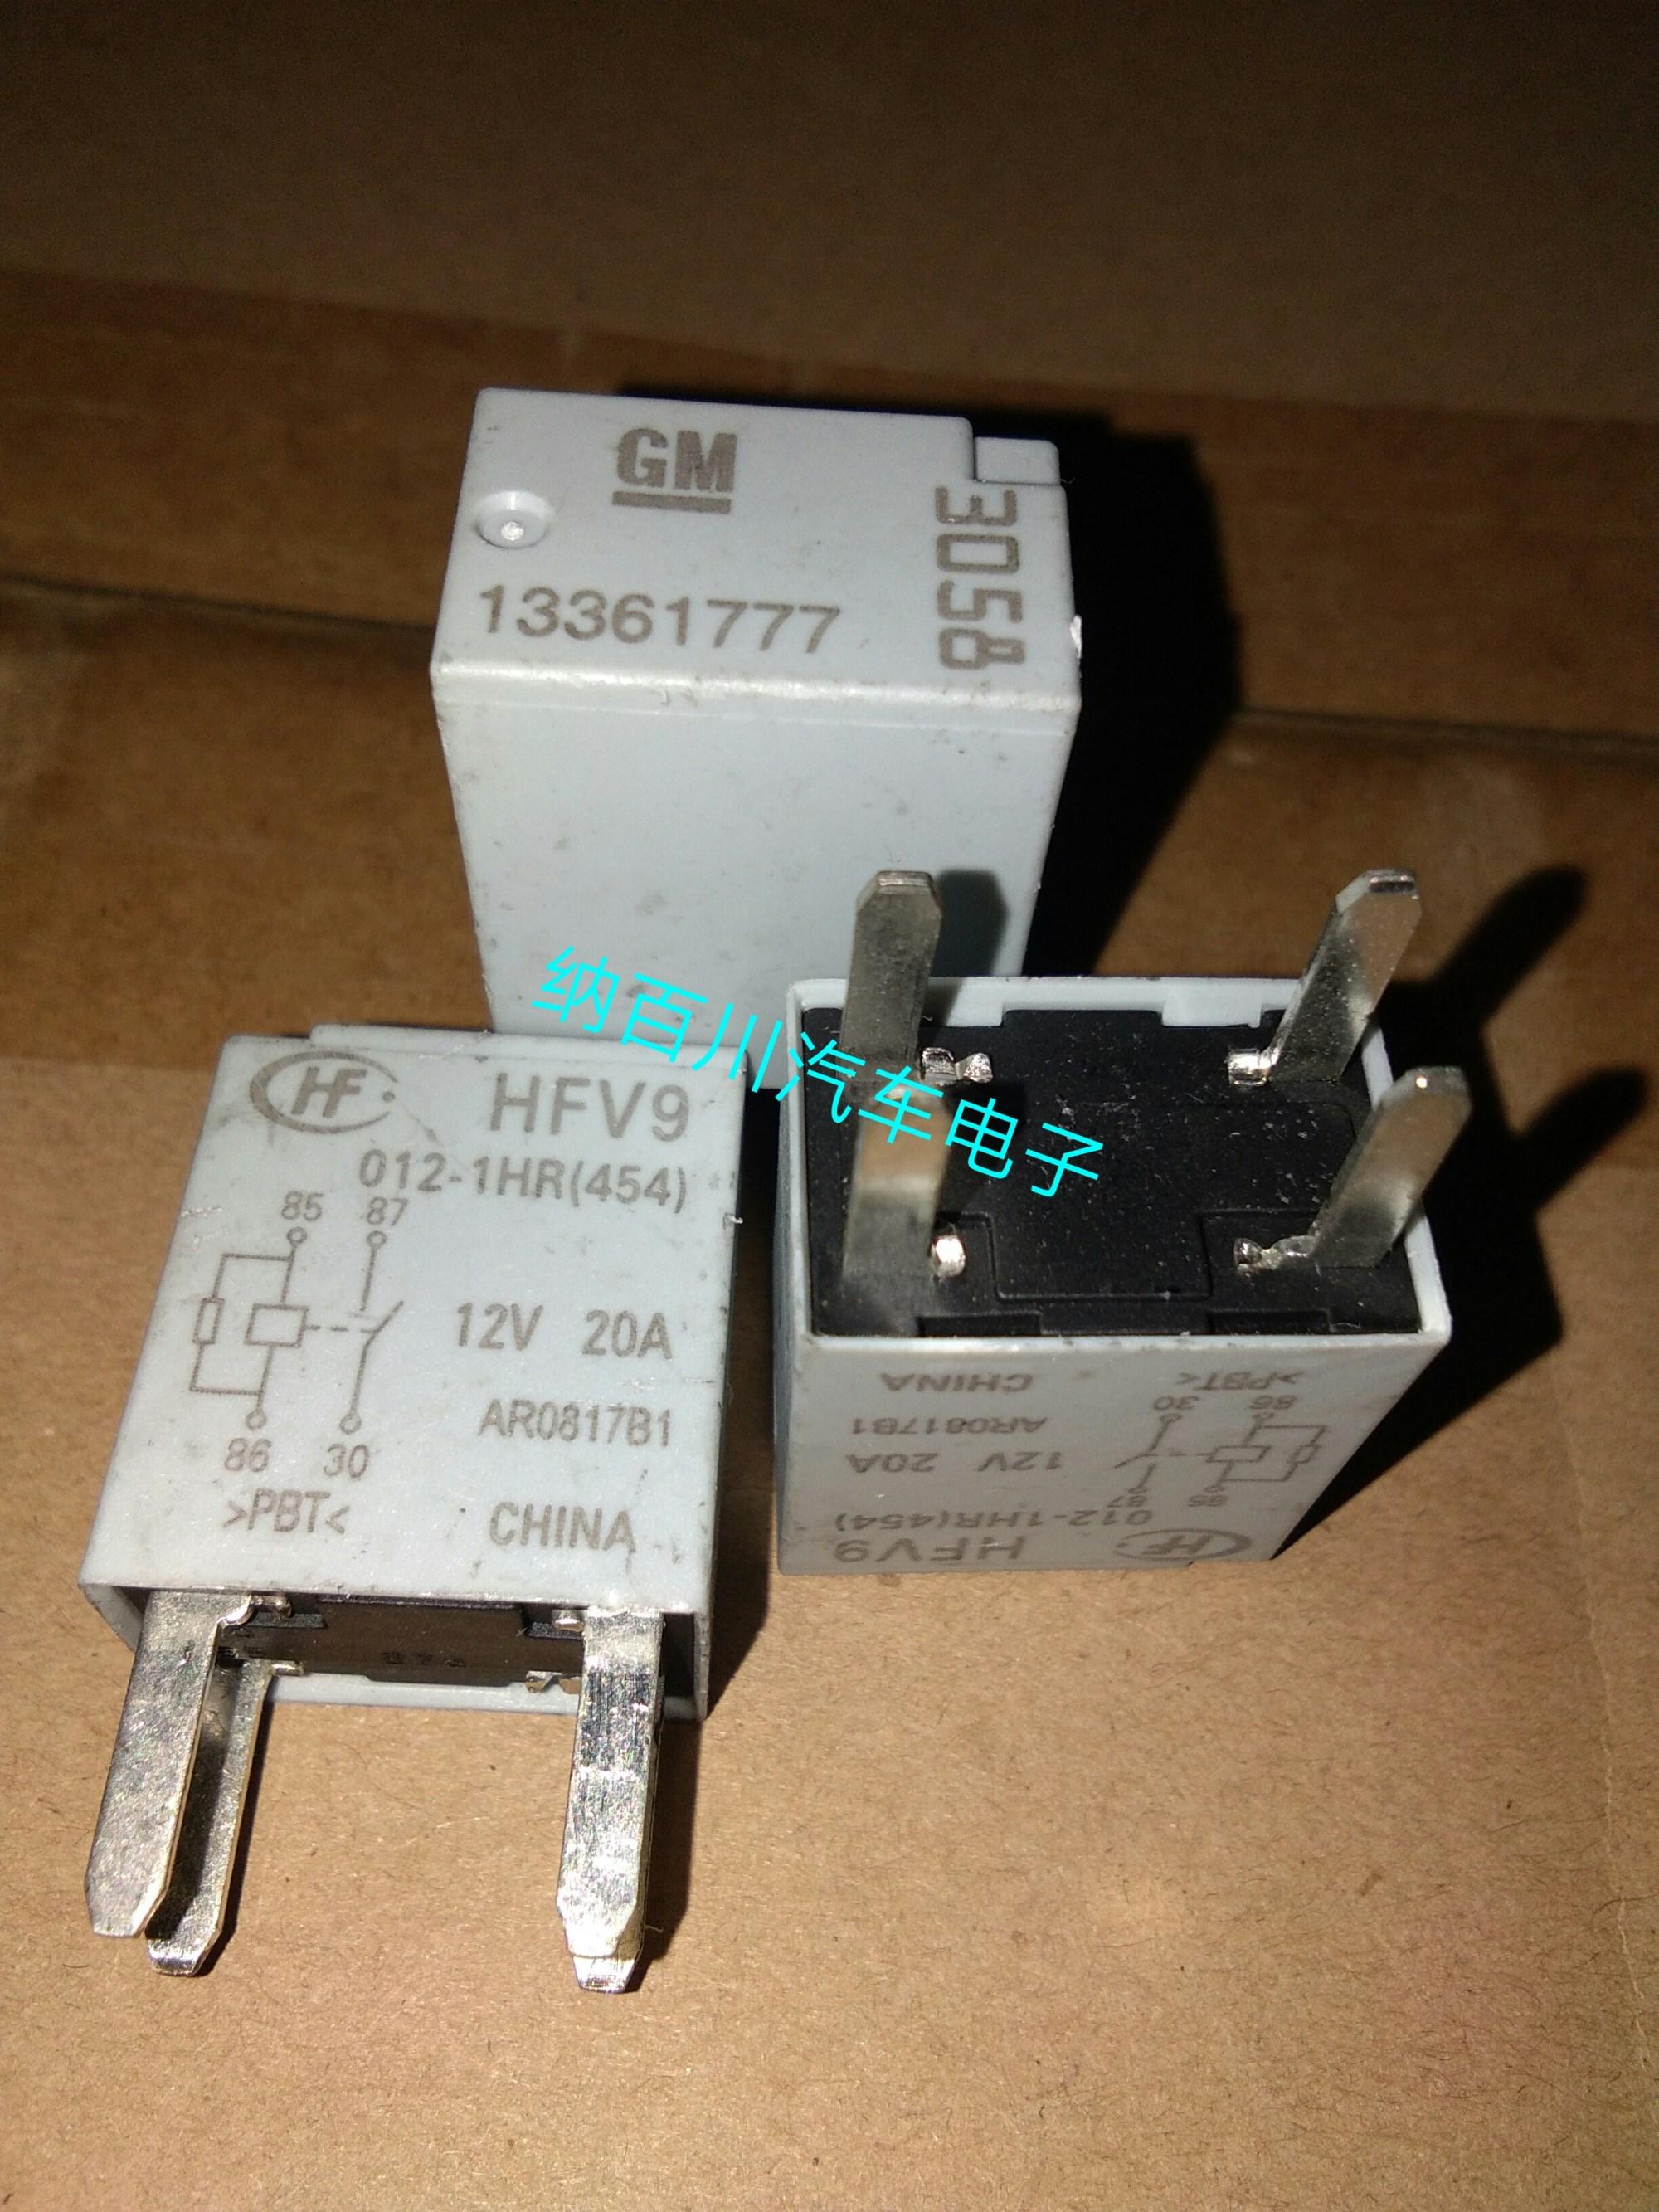 hight resolution of jun yue mai rui bao xl fuse box 3058 relay 13361777 genuine original car parts 12v